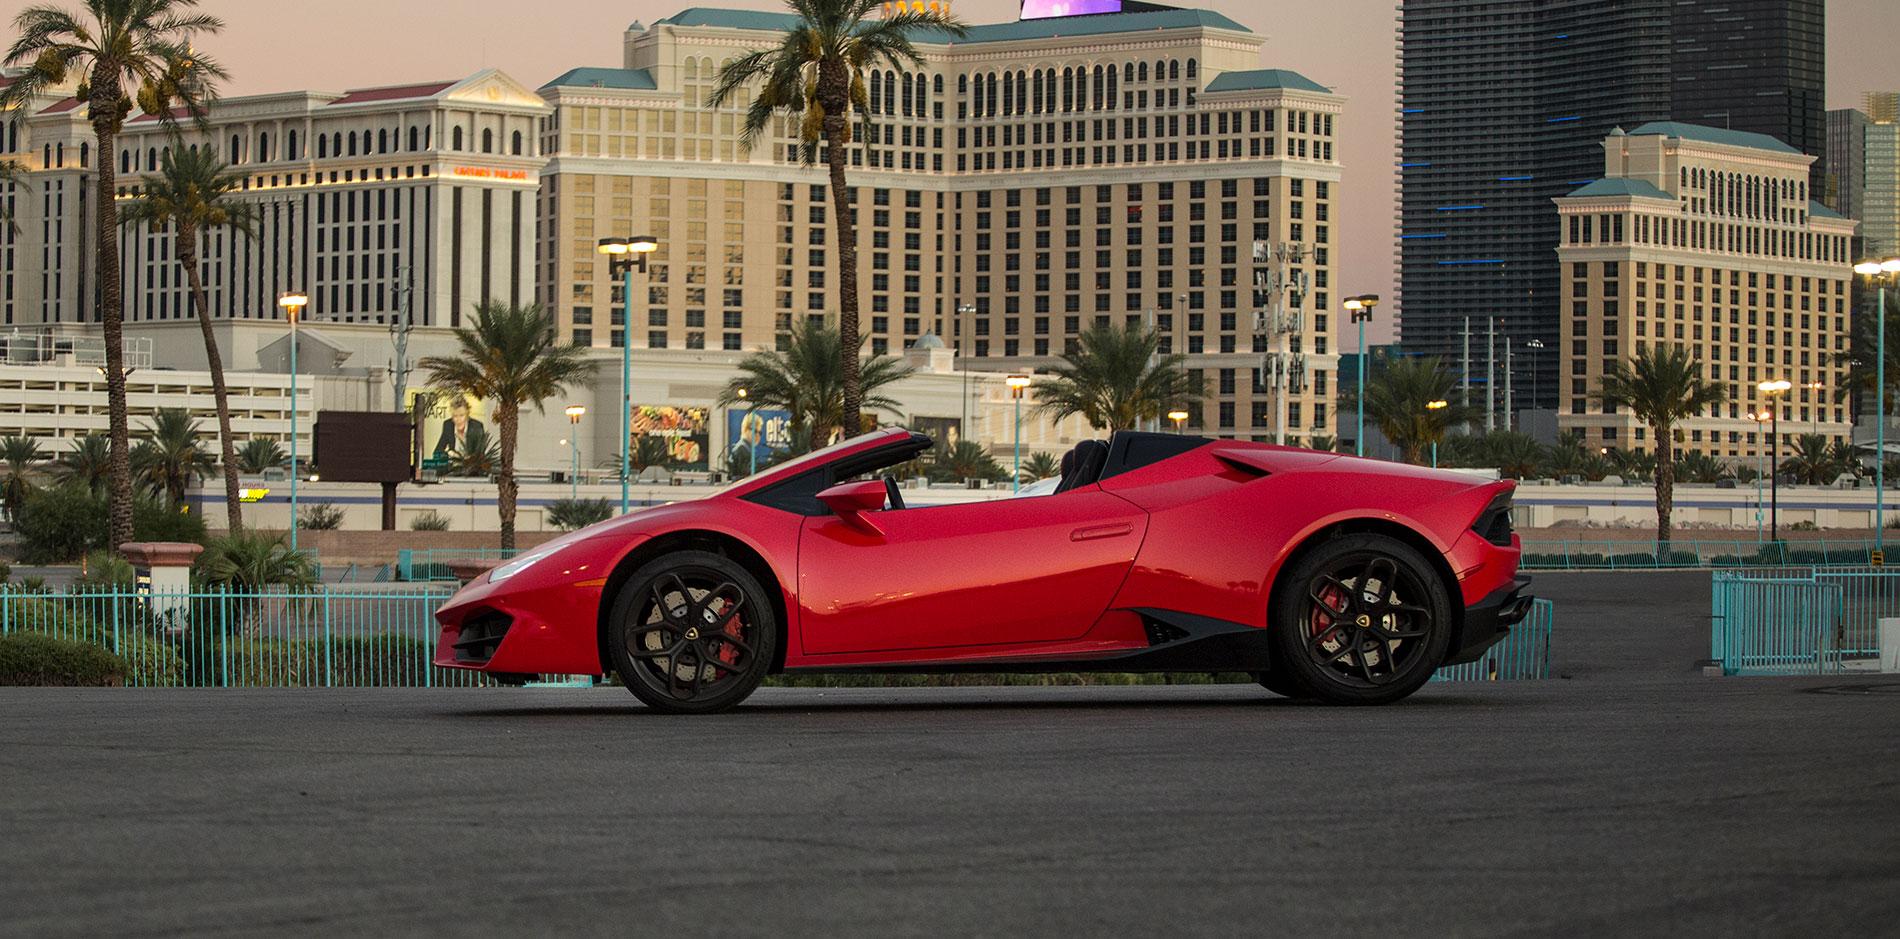 Red Lamborghini Convertible